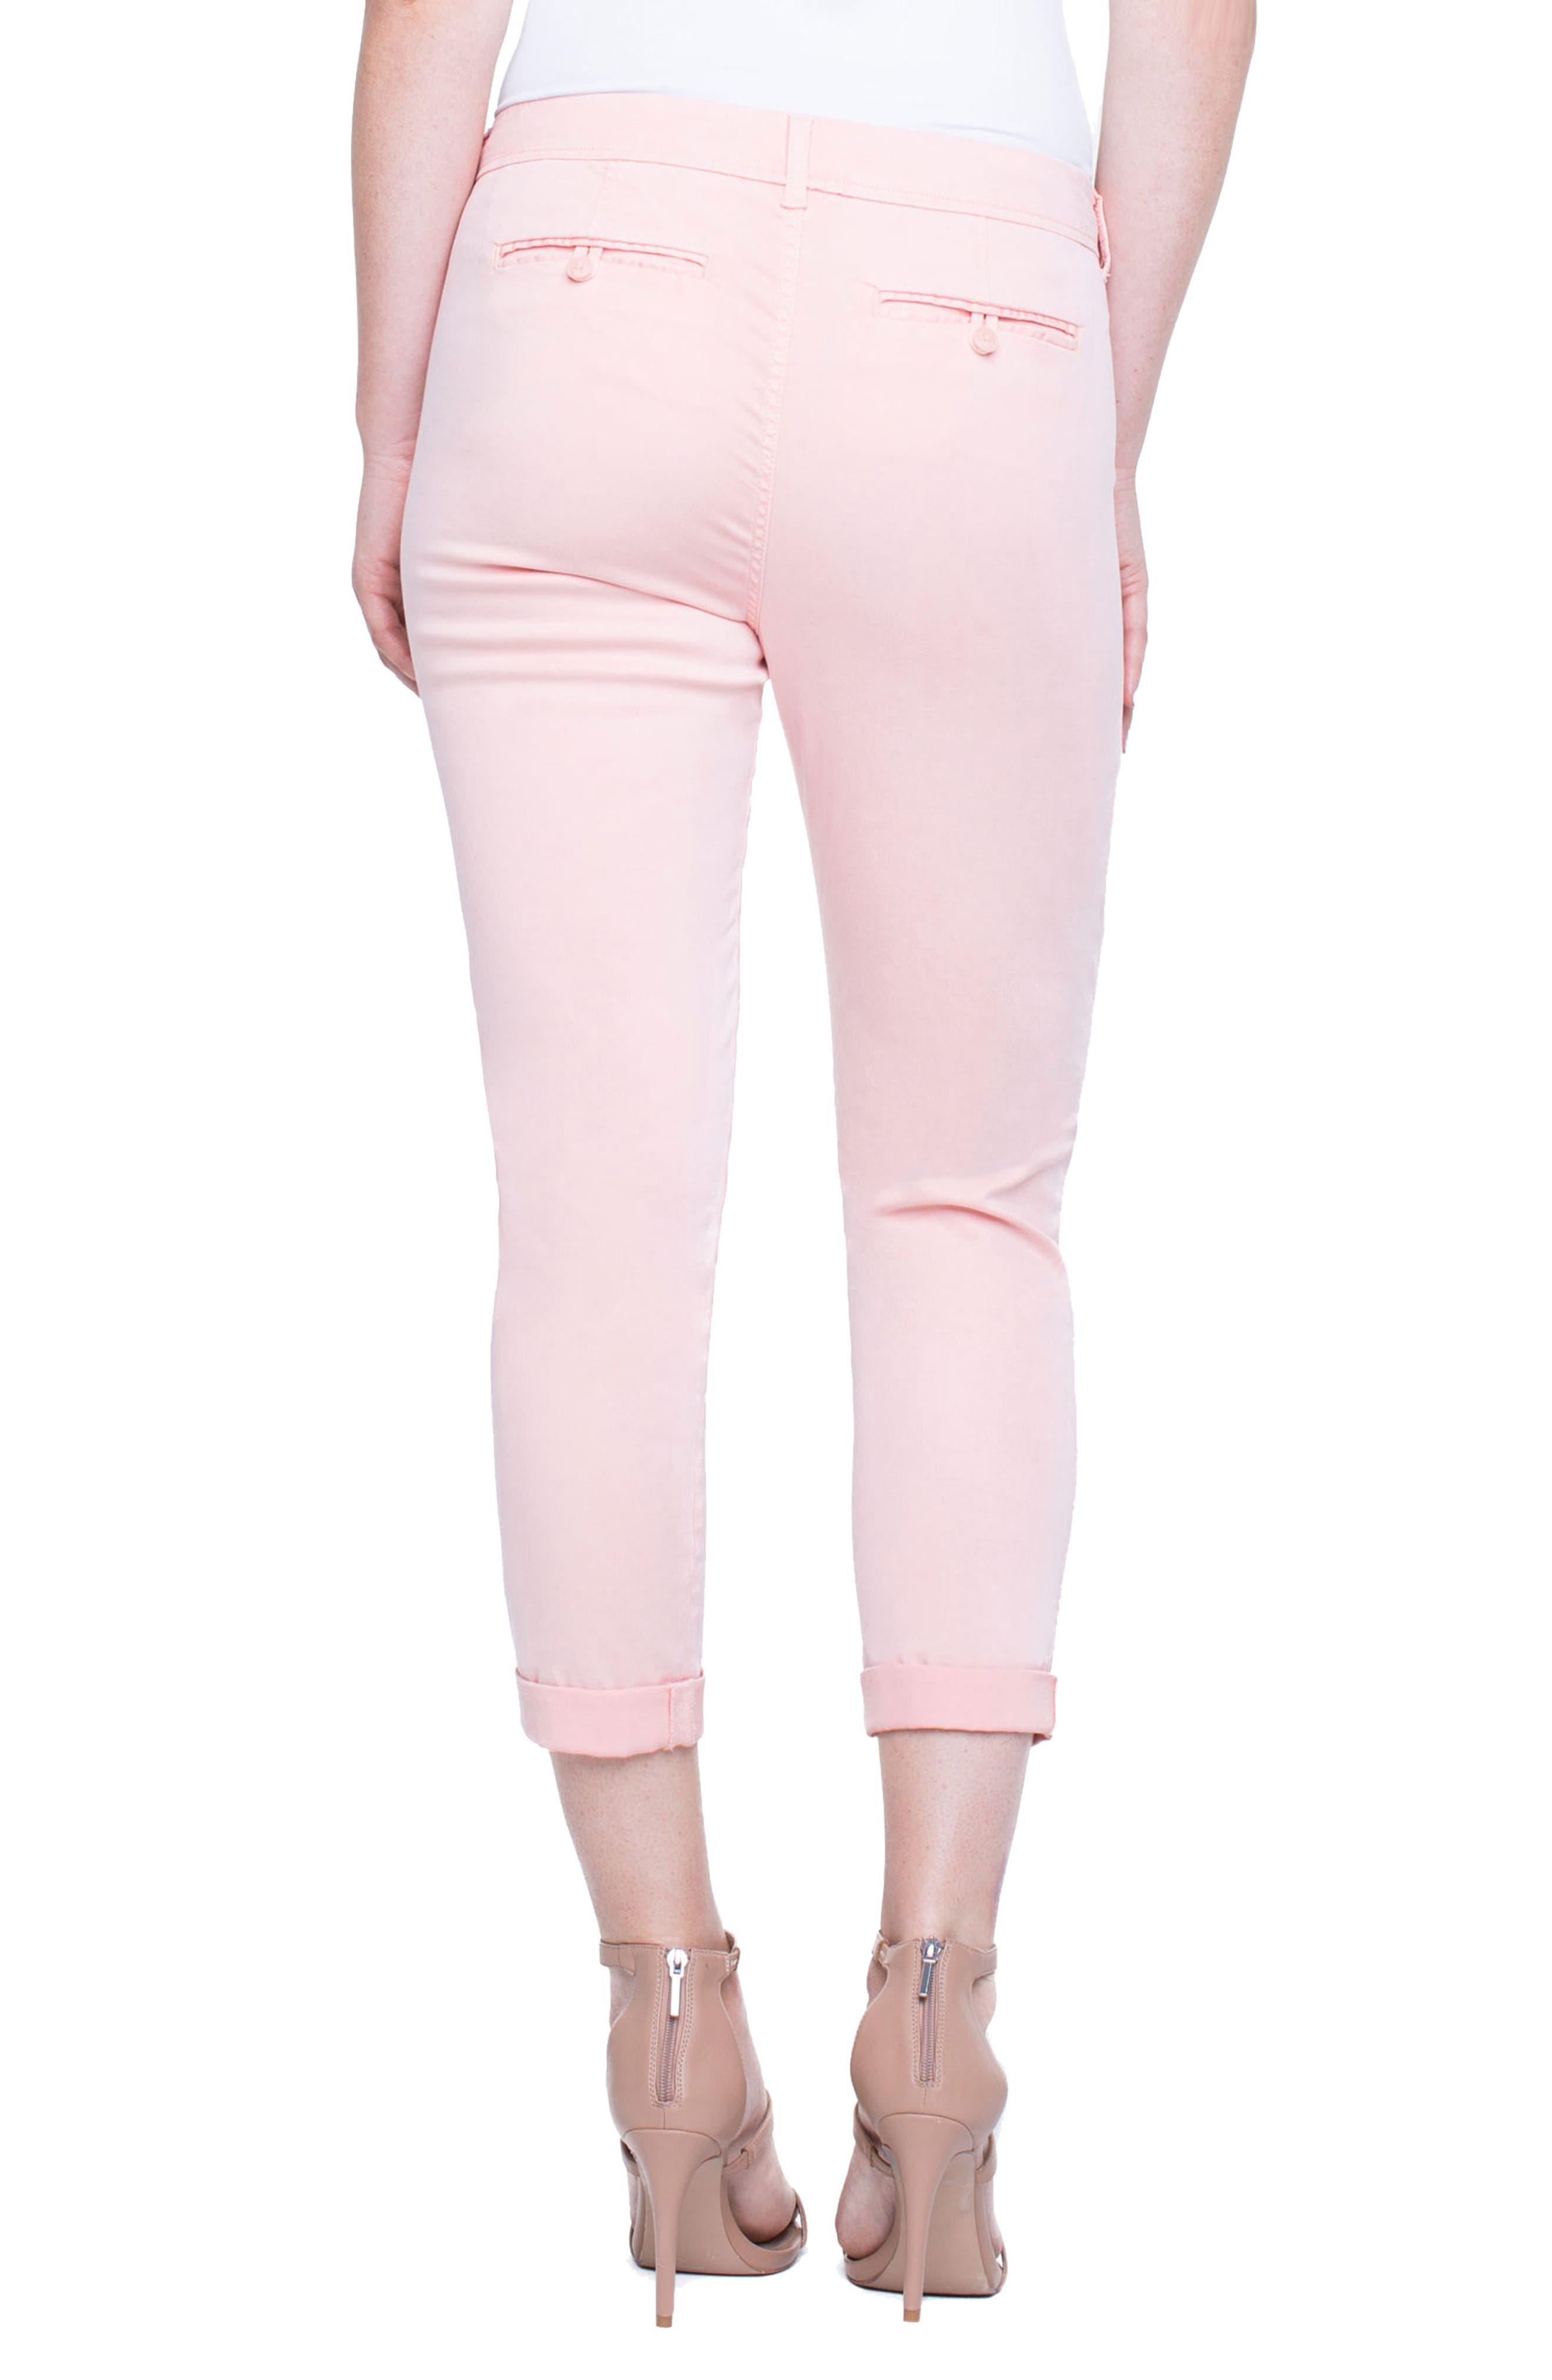 Buddy Pants,                             Alternate thumbnail 3, color,                             Bombay Pink